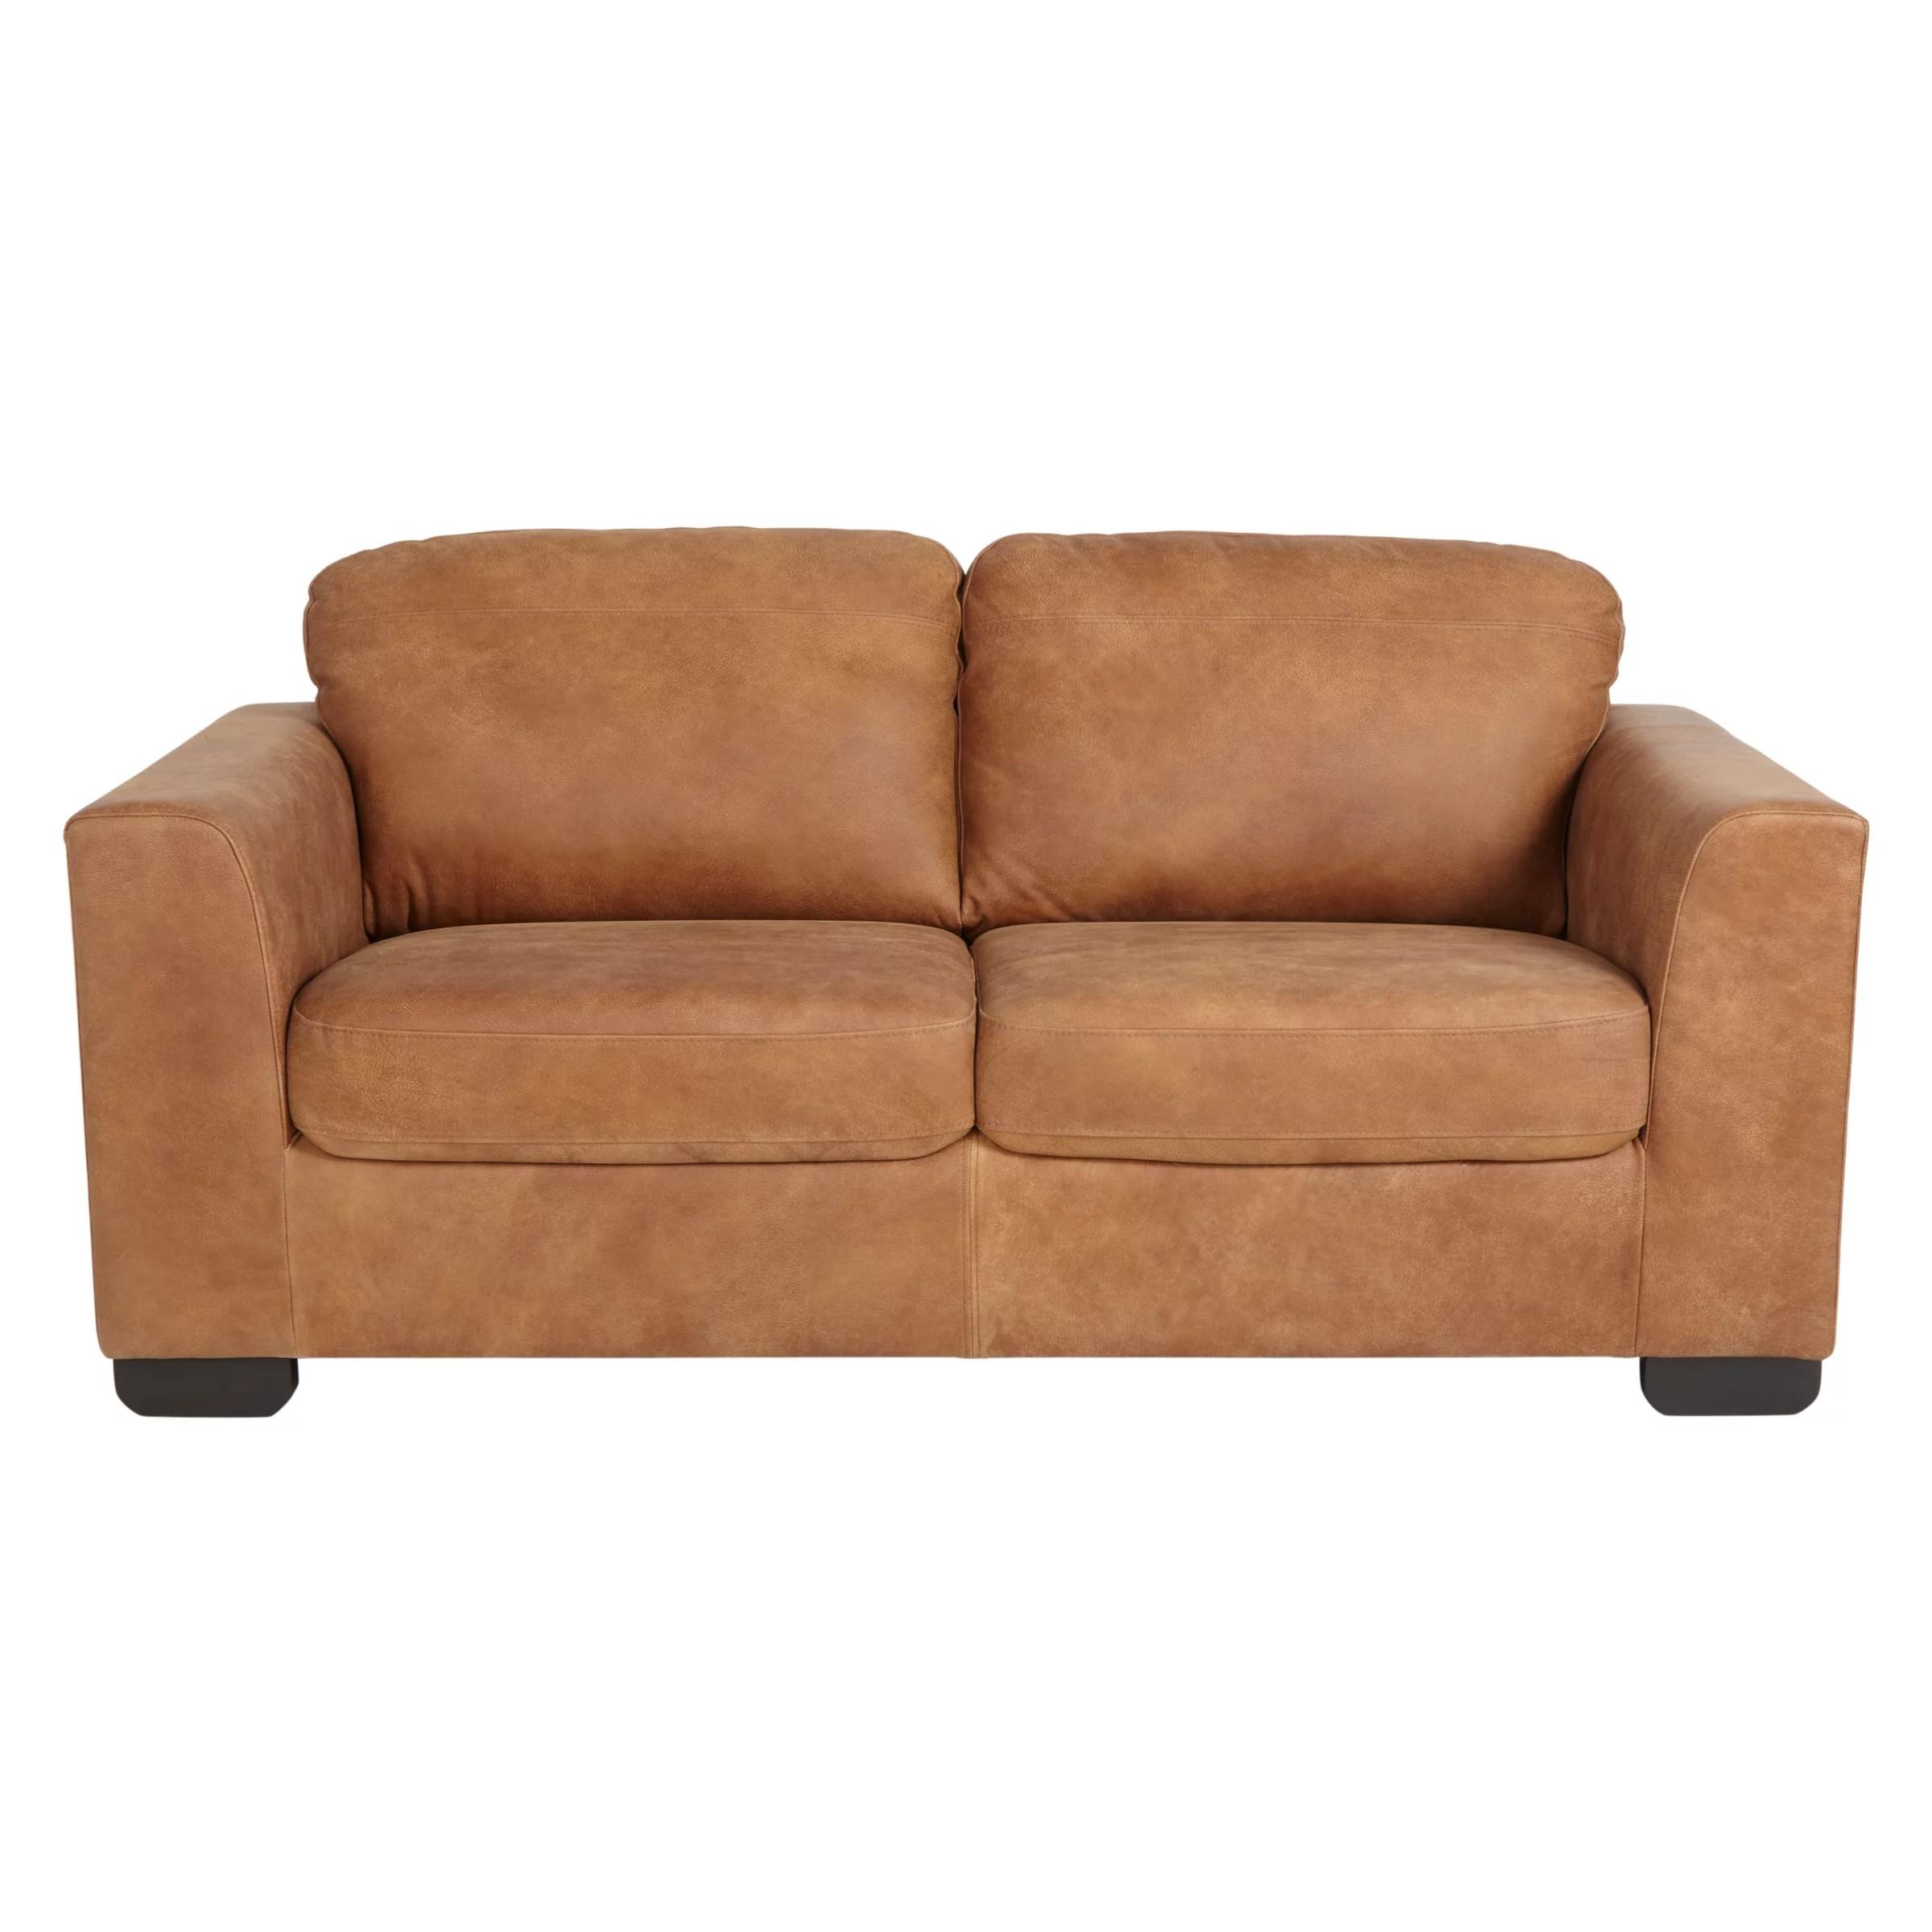 next quentin sofa bed review e cia criciuma telefone john lewis cooper large 3 seater dark leg masai brown at buyjohn online johnlewis